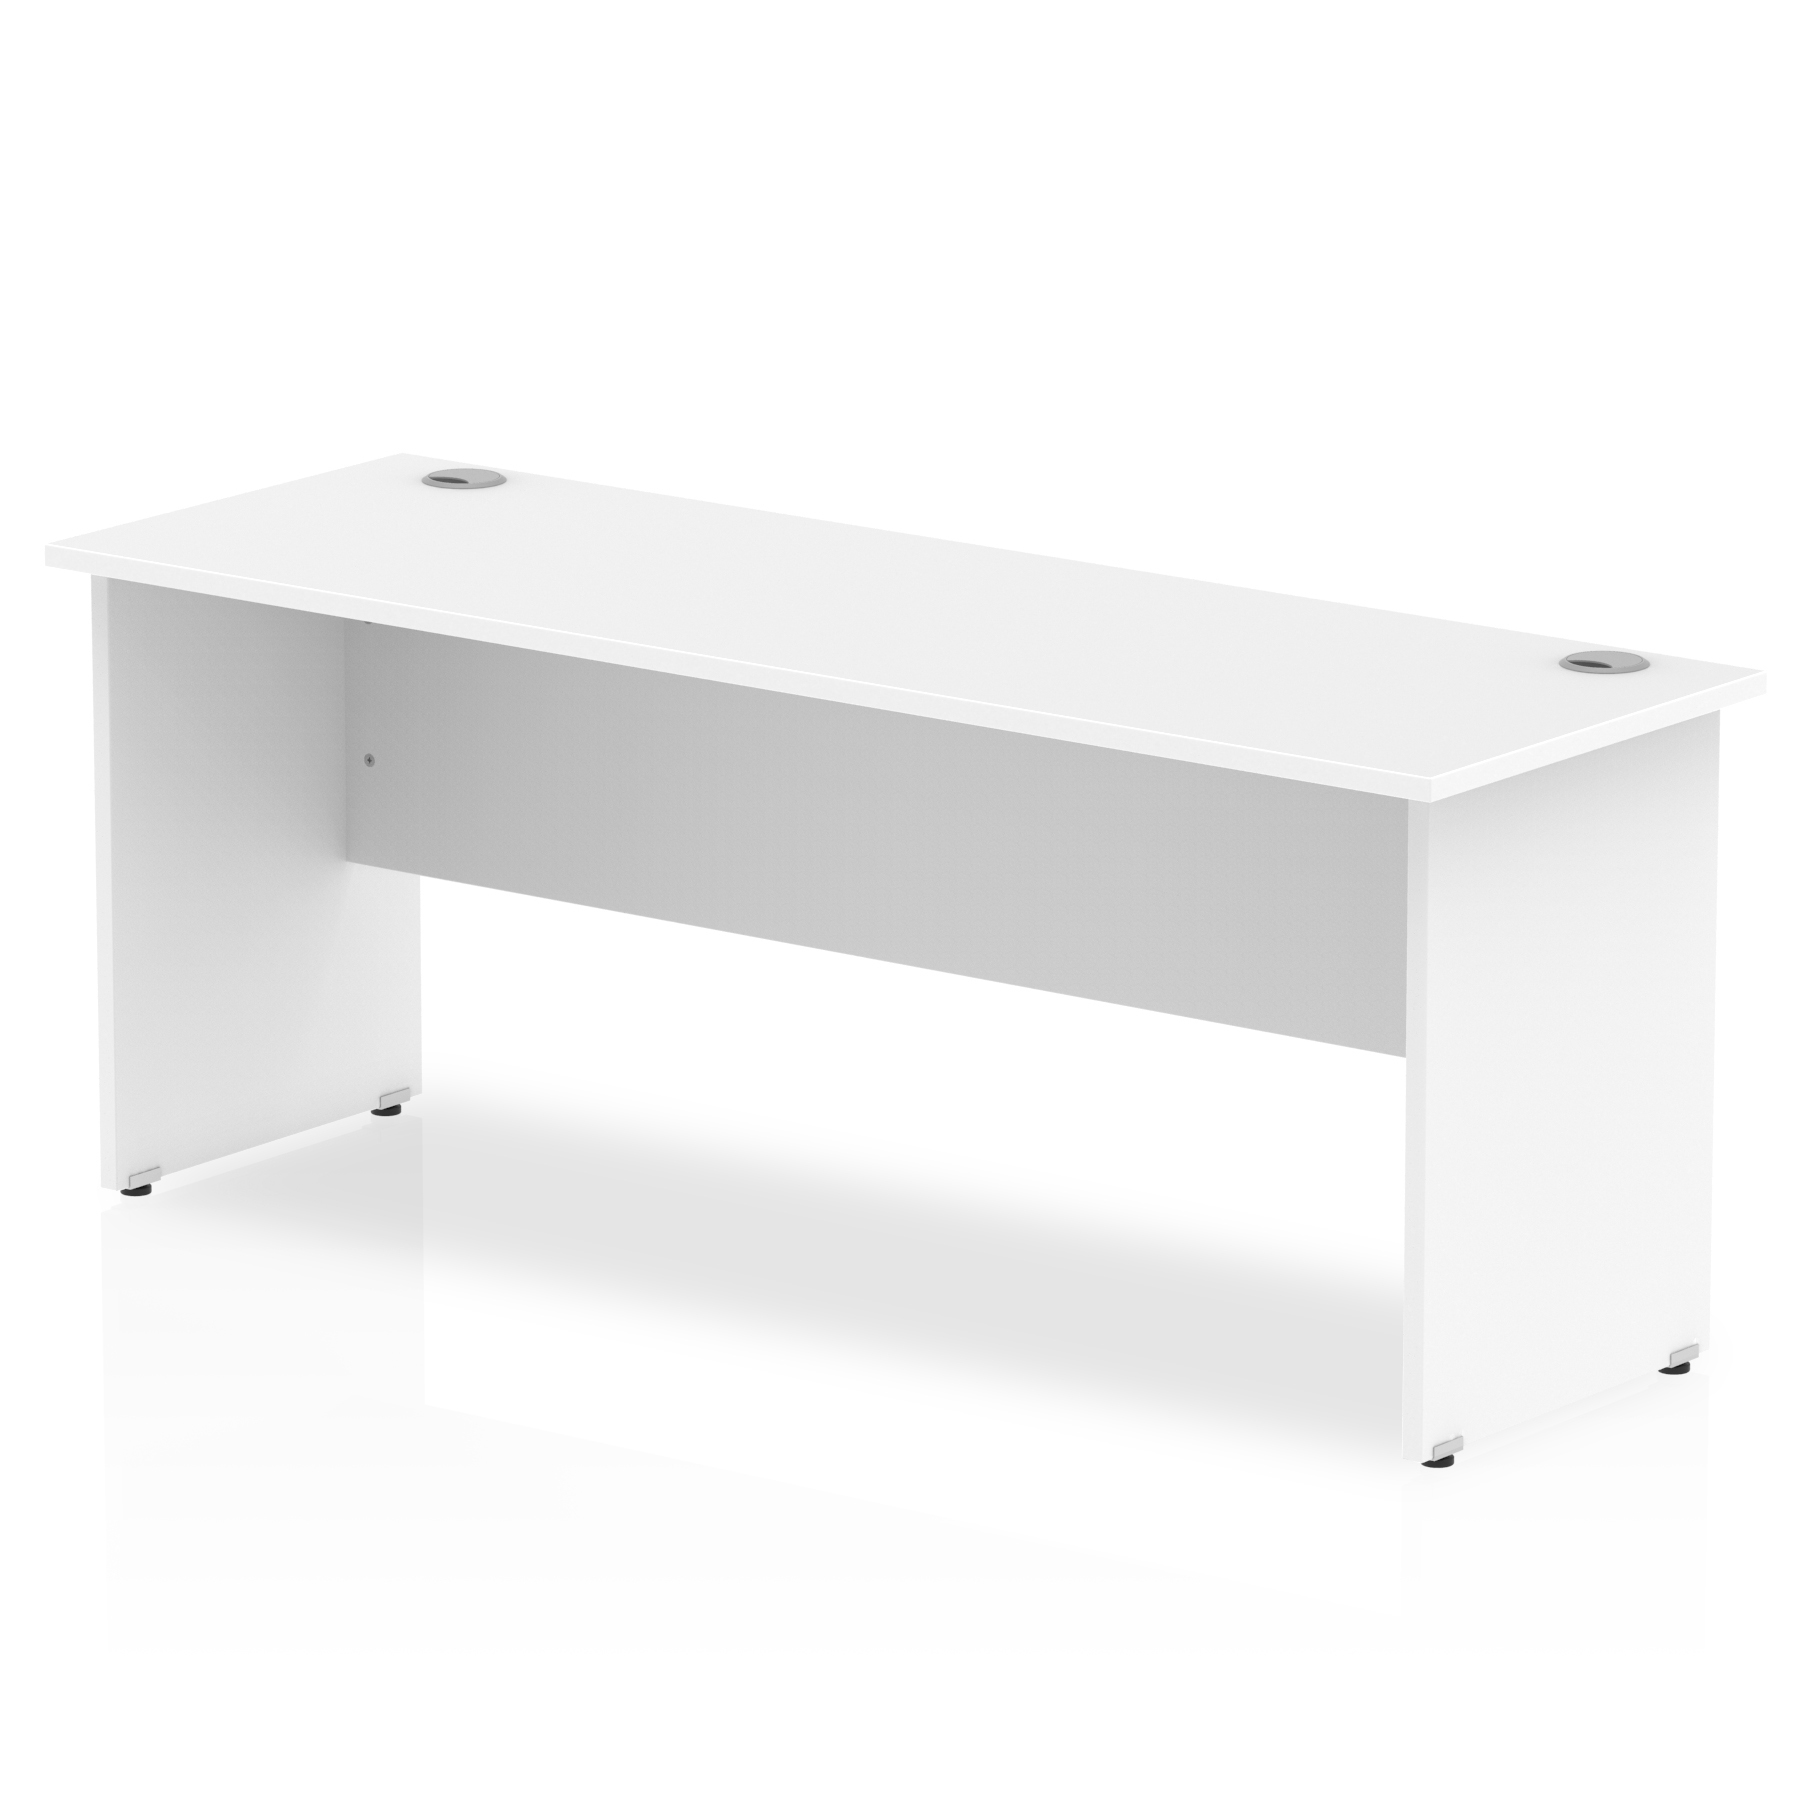 Trexus Desk Rectangle Panel End Leg 1800x600mm White Ref MI002249